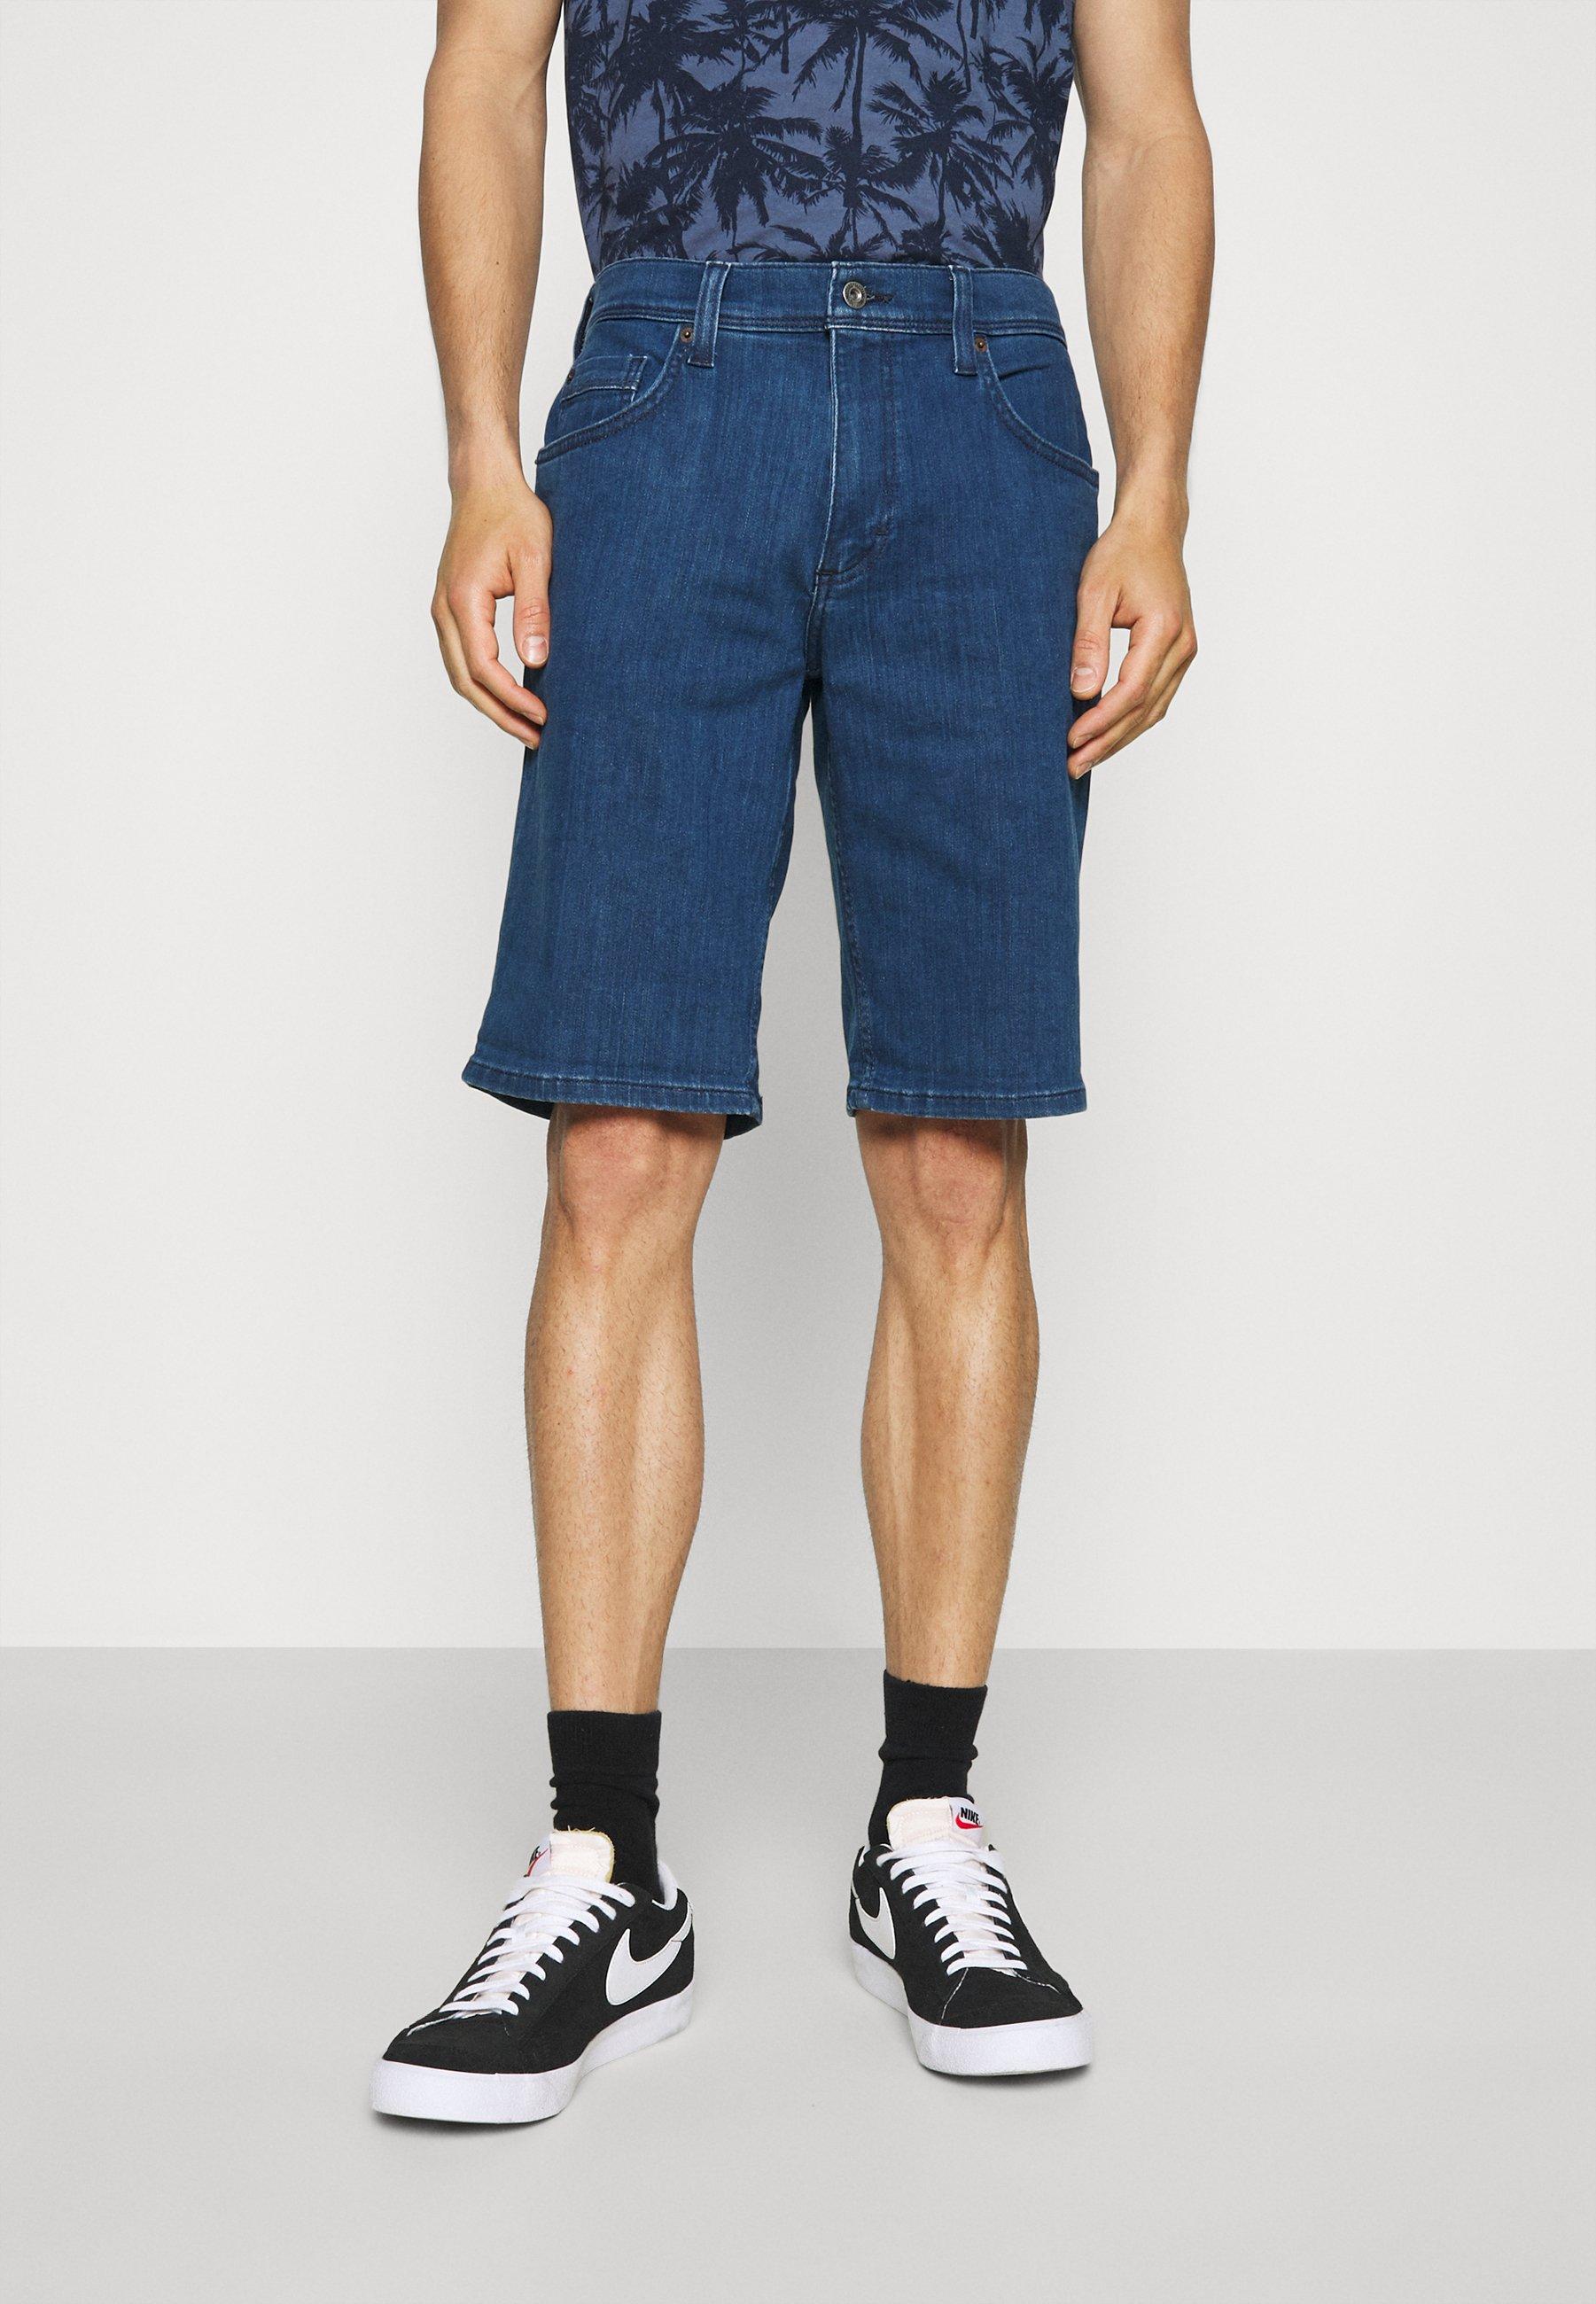 Uomo WASHINGTON - Shorts di jeans